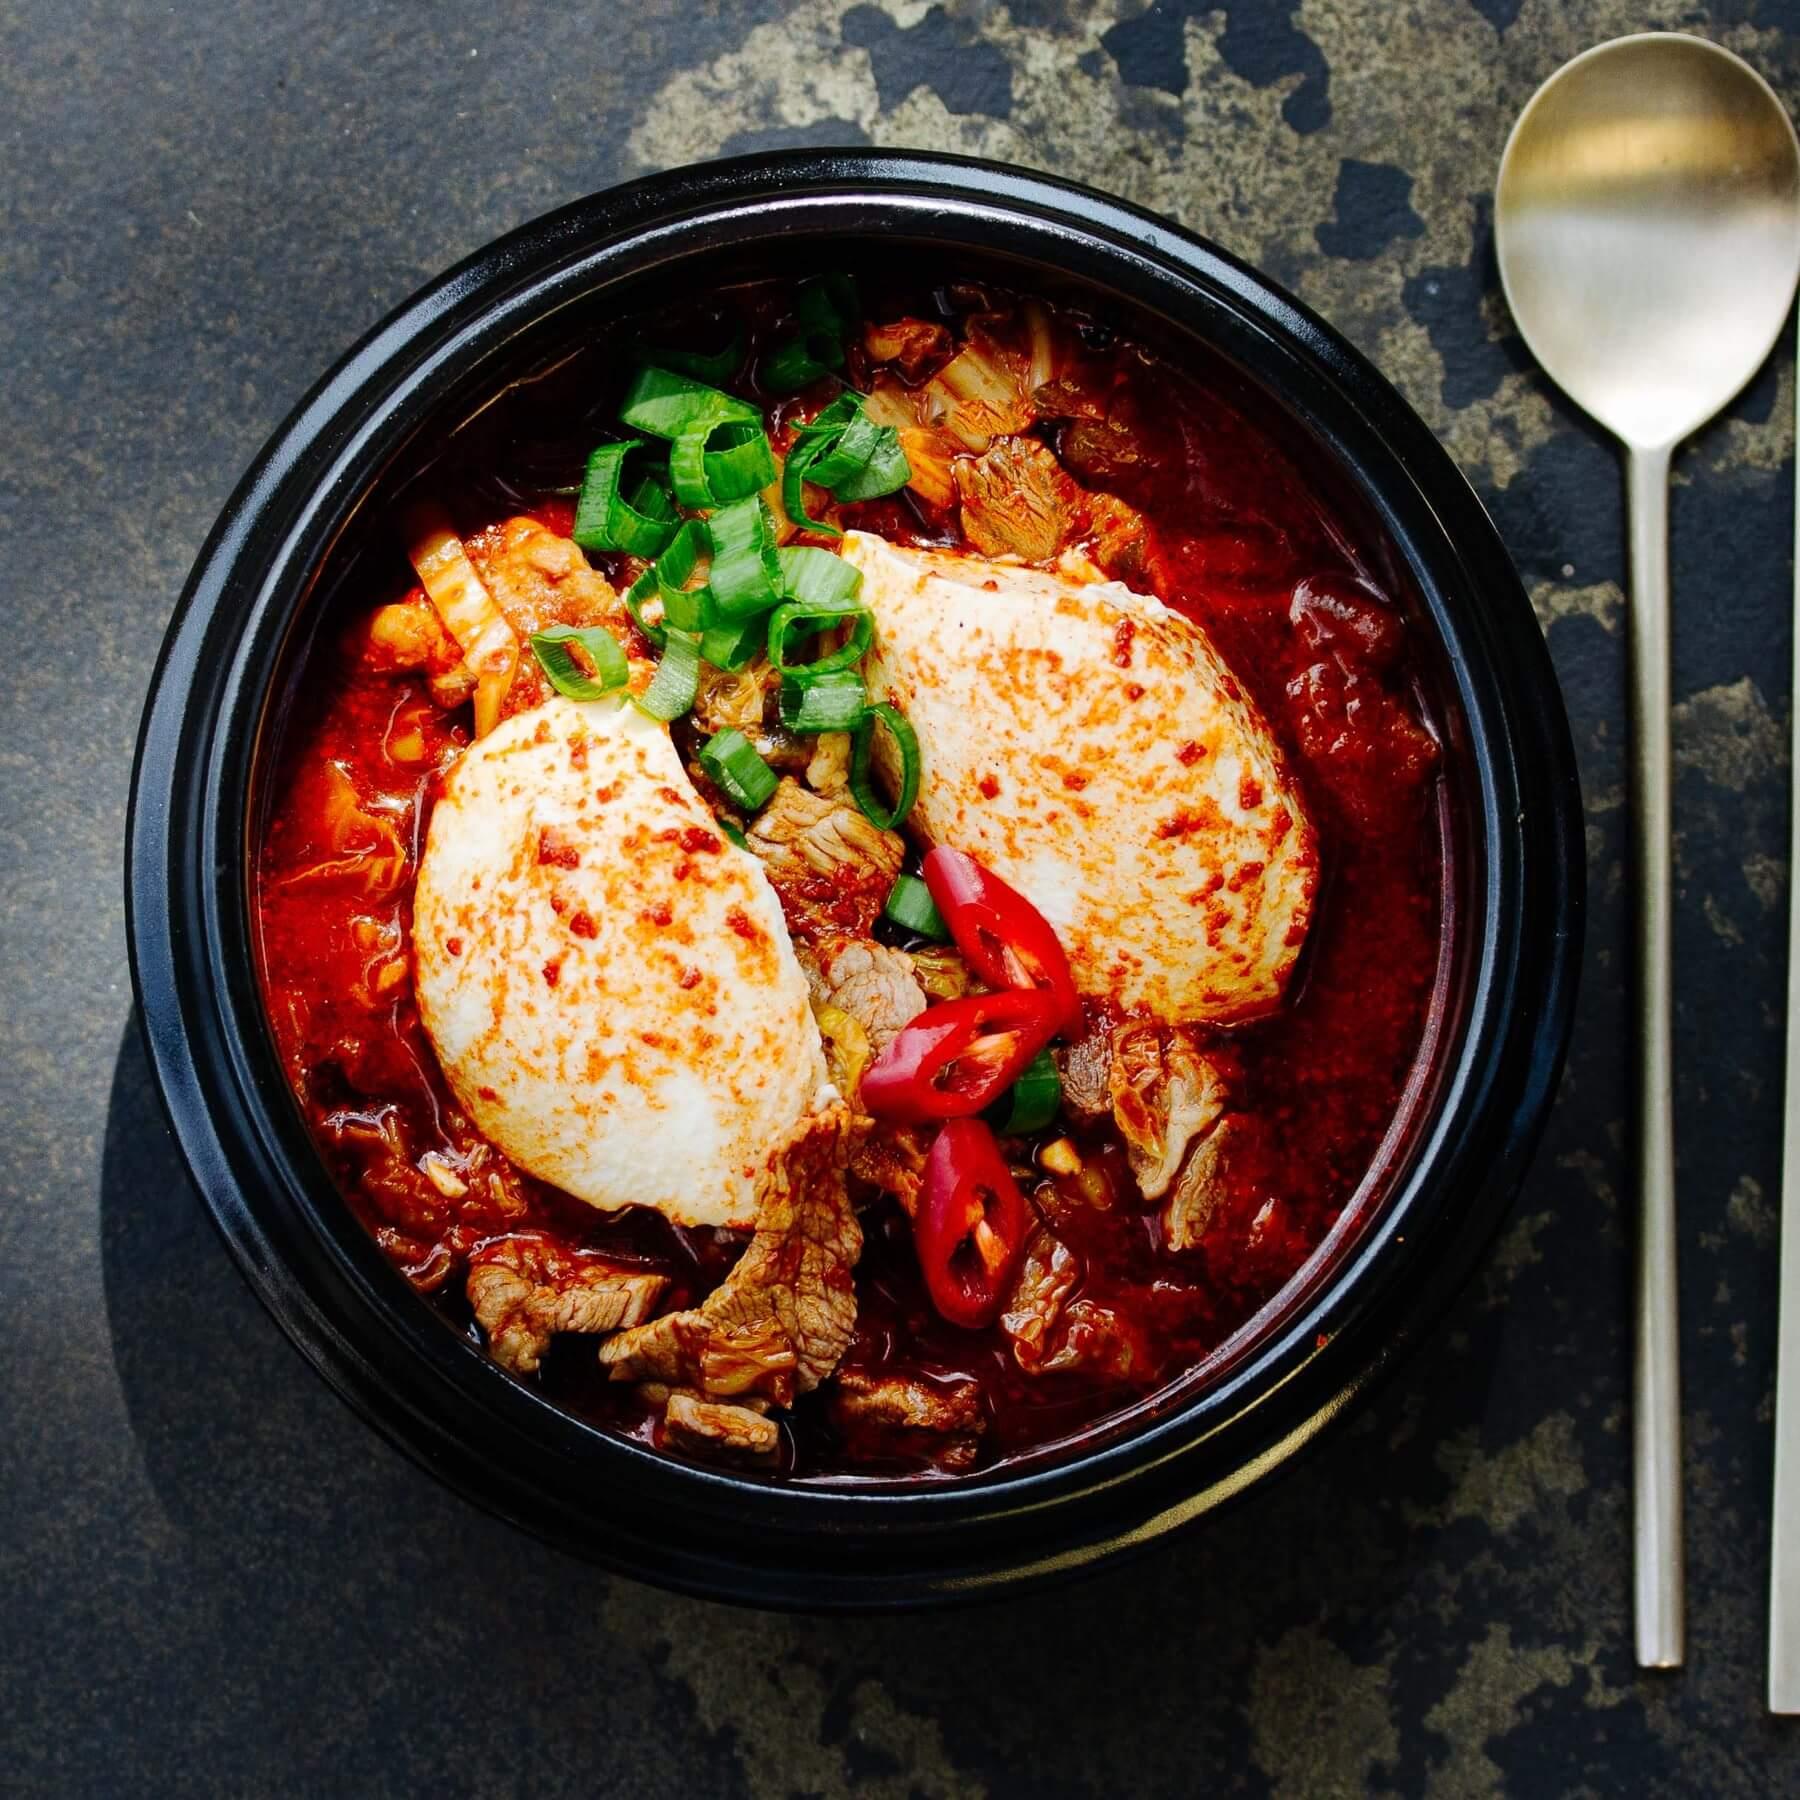 Scharfer Tofu Eintopf mit Kimchi aus Korea - Sundubu Jjigae